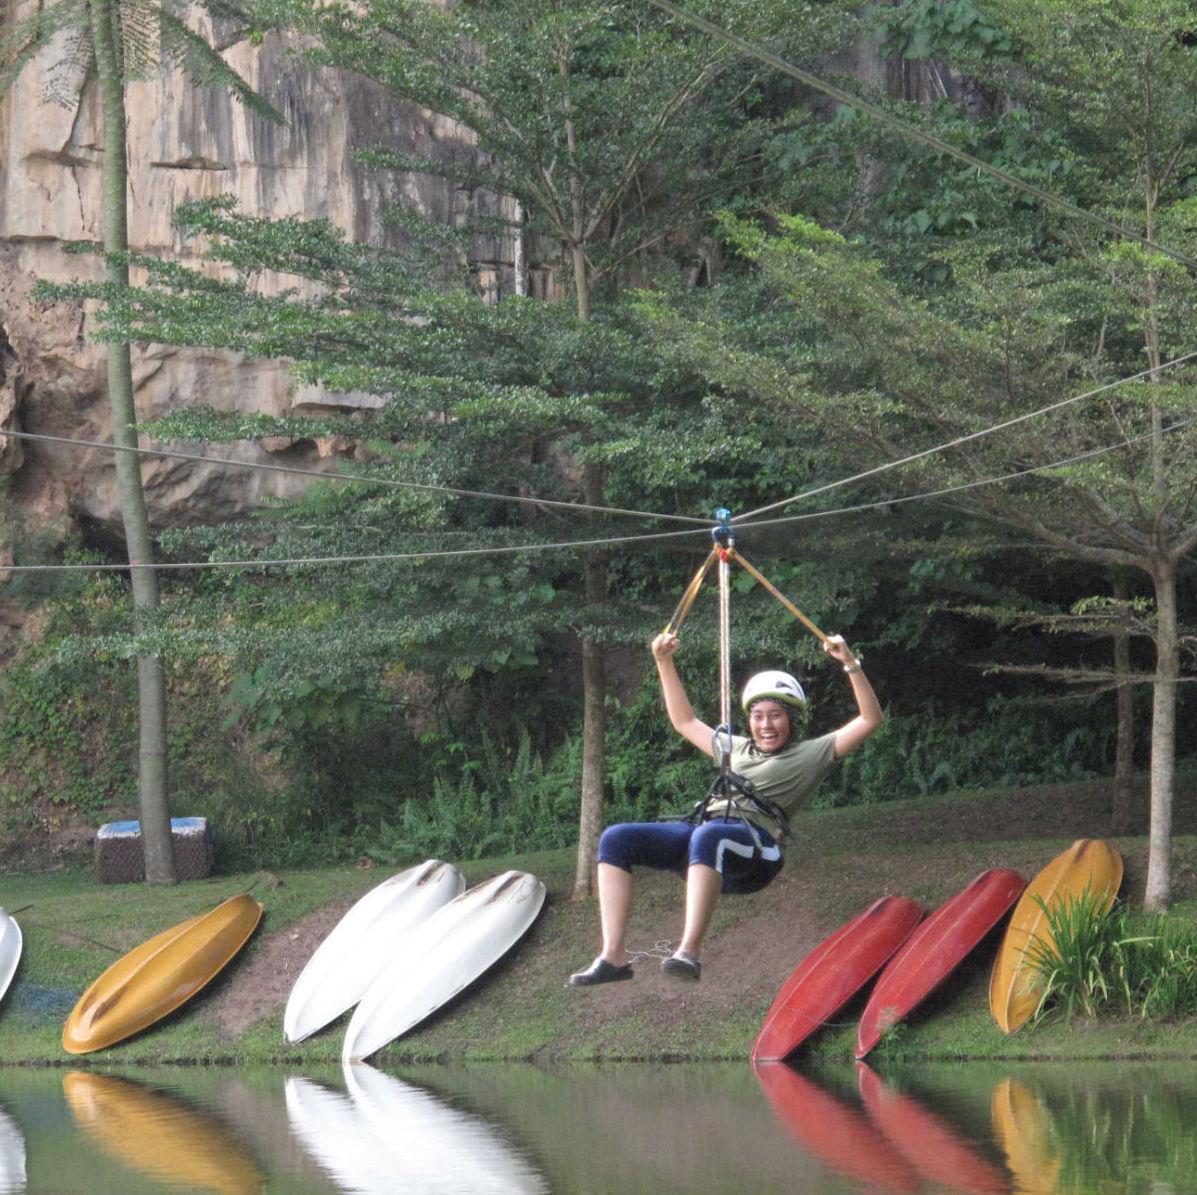 Ziplining in Lost World of Tambun